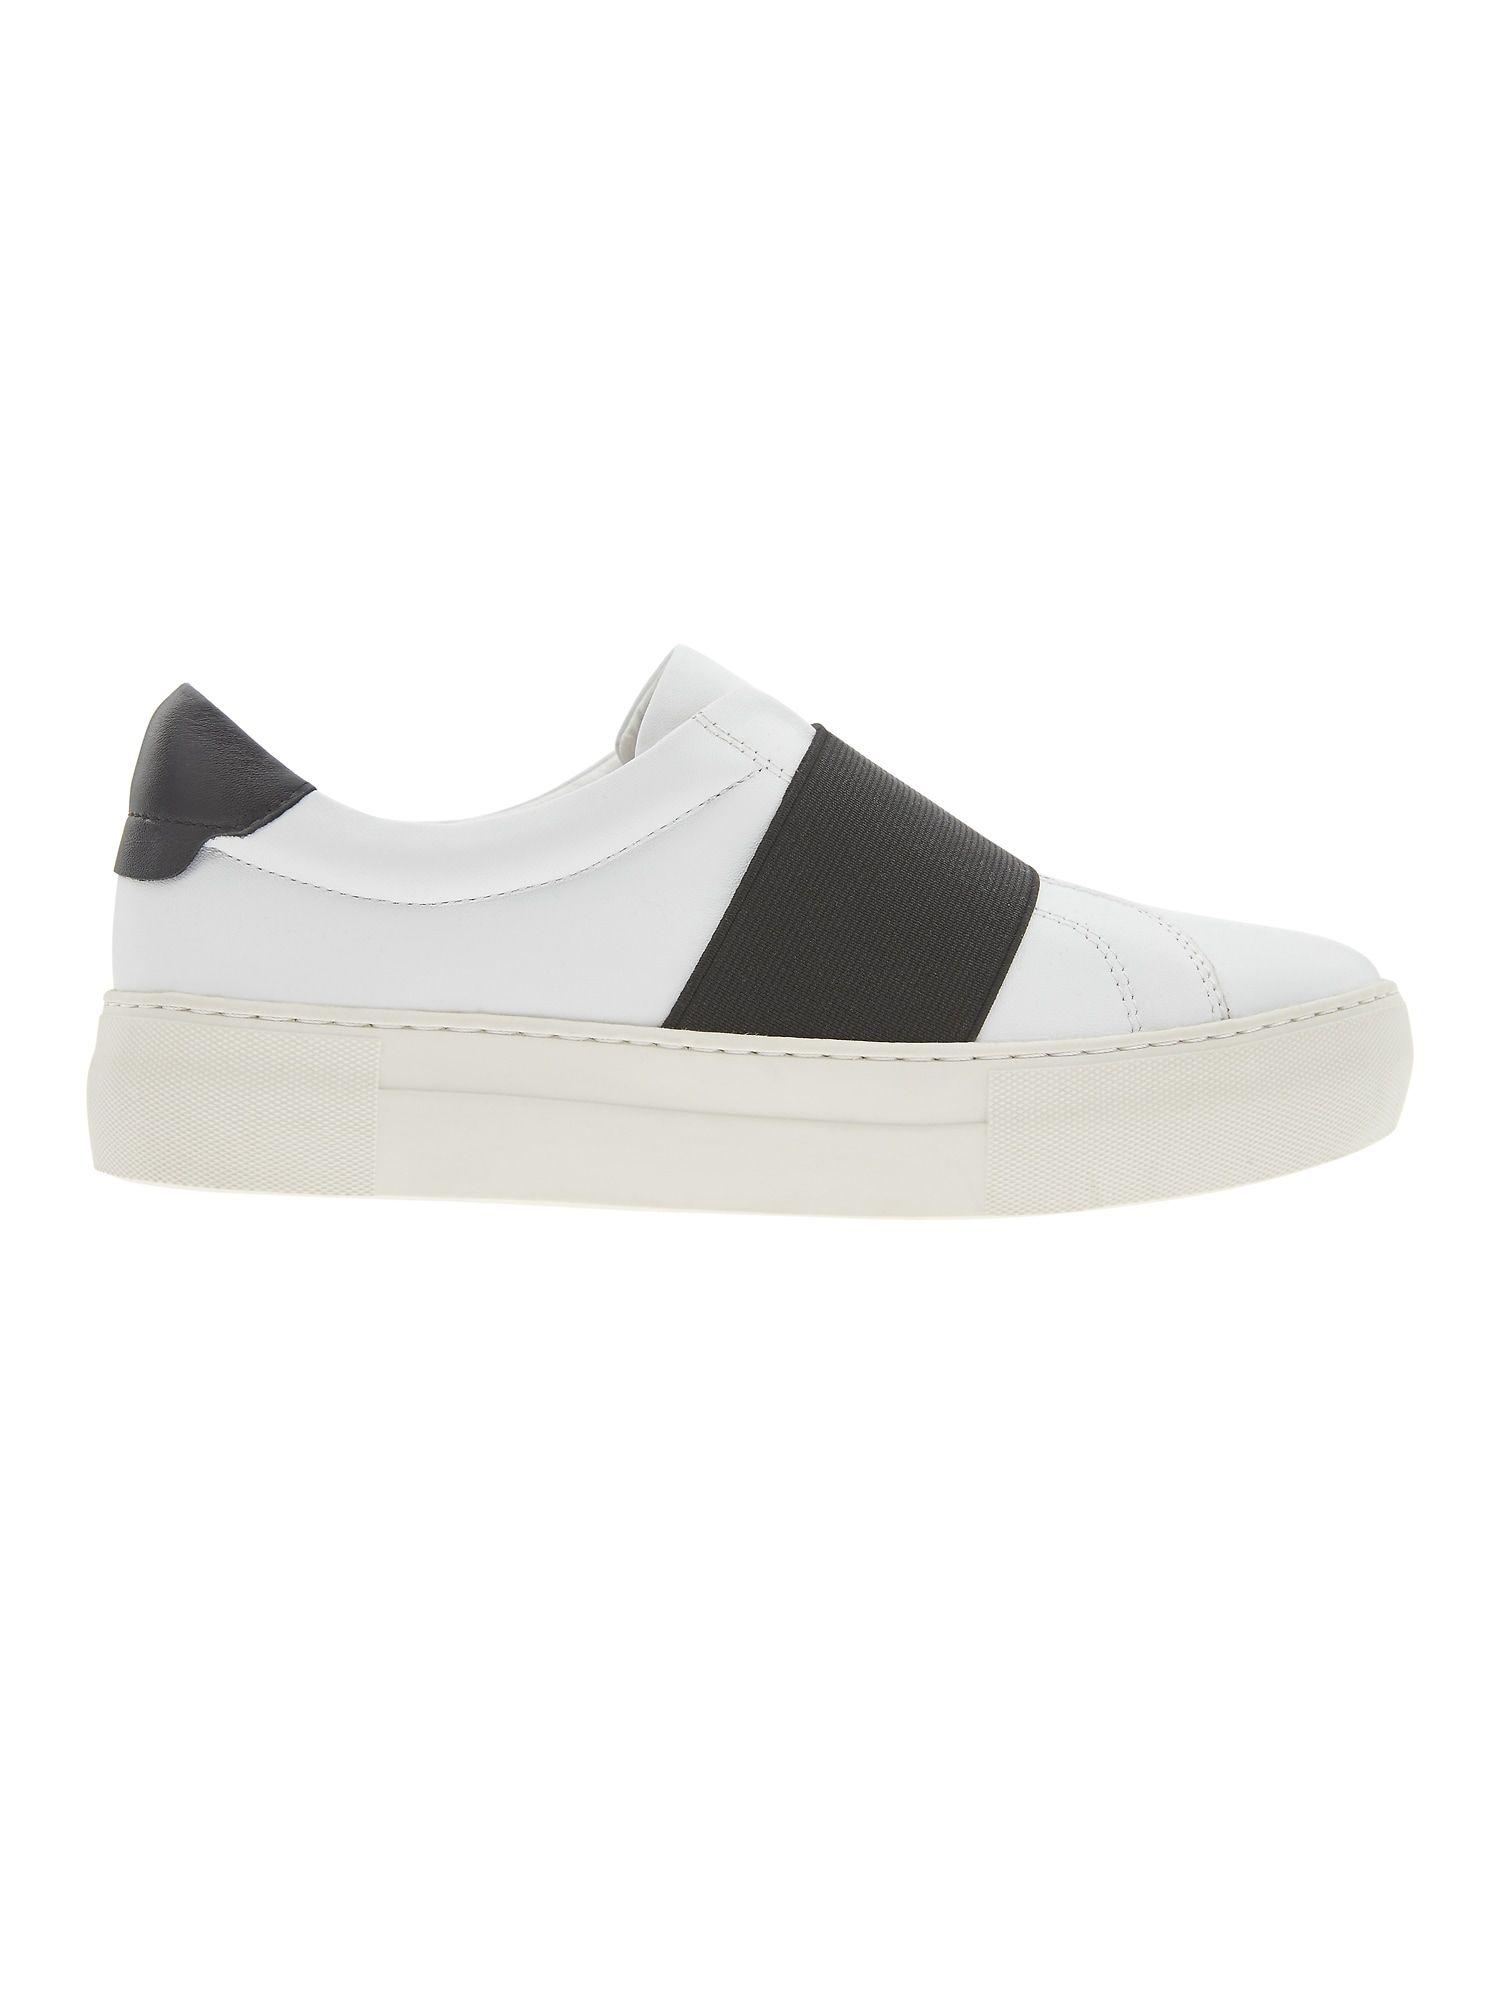 Stylish athletic shoes, Cheap boutique